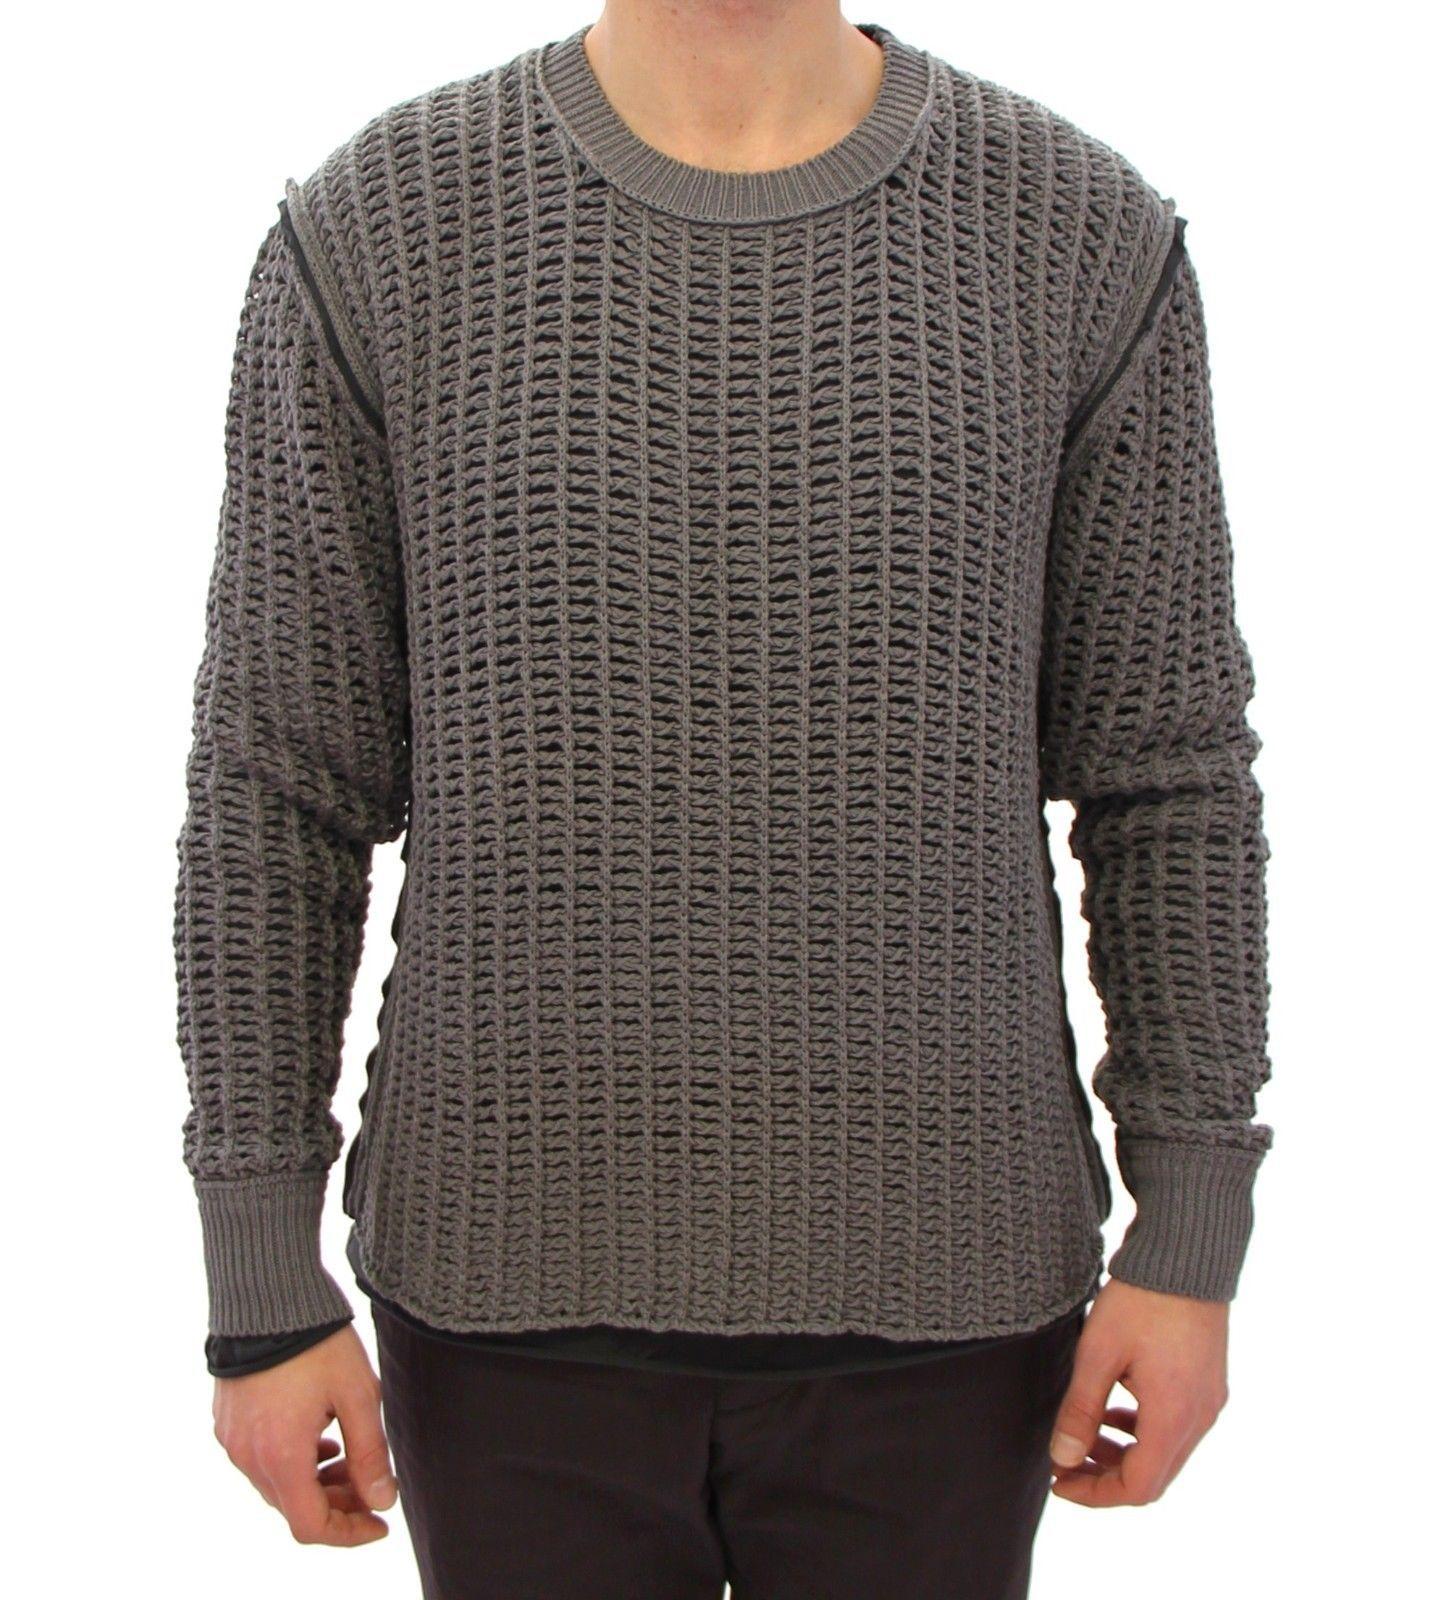 Dolce & Gabbana Men's Runway Netz Pullover Netted Sweater Gray GTH10683 - IT48 | M